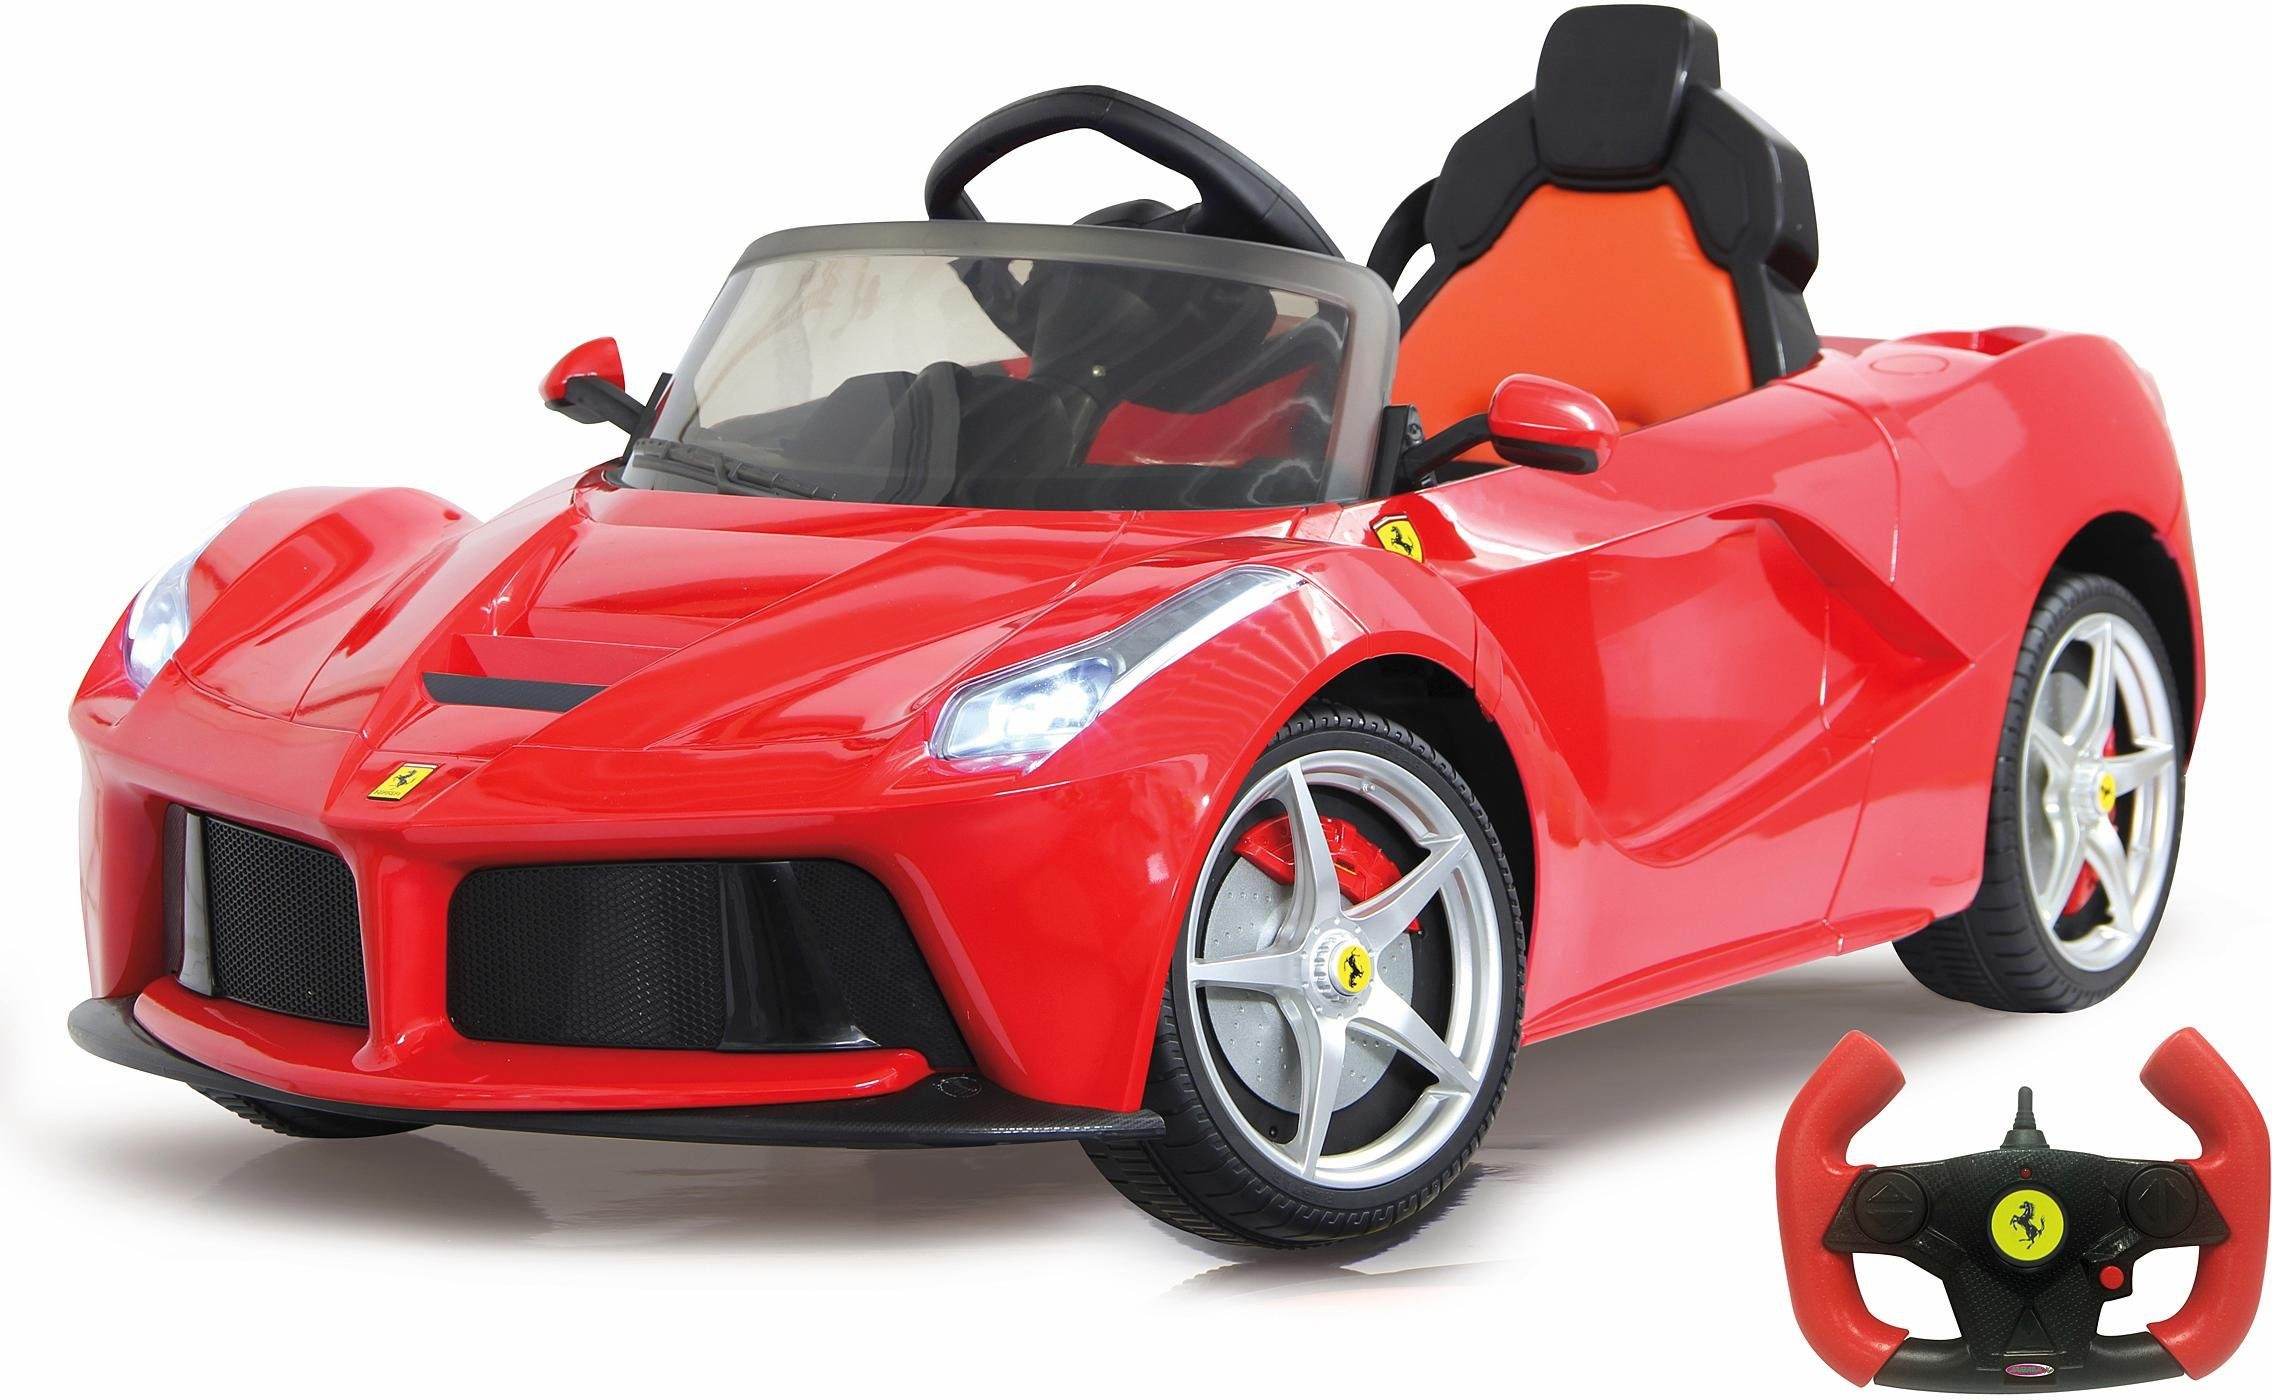 JAMARA Elektrofahrzeug für Kinder, »JAMARA KIDS Ride On Ferrari LaFerrari rot 6V«